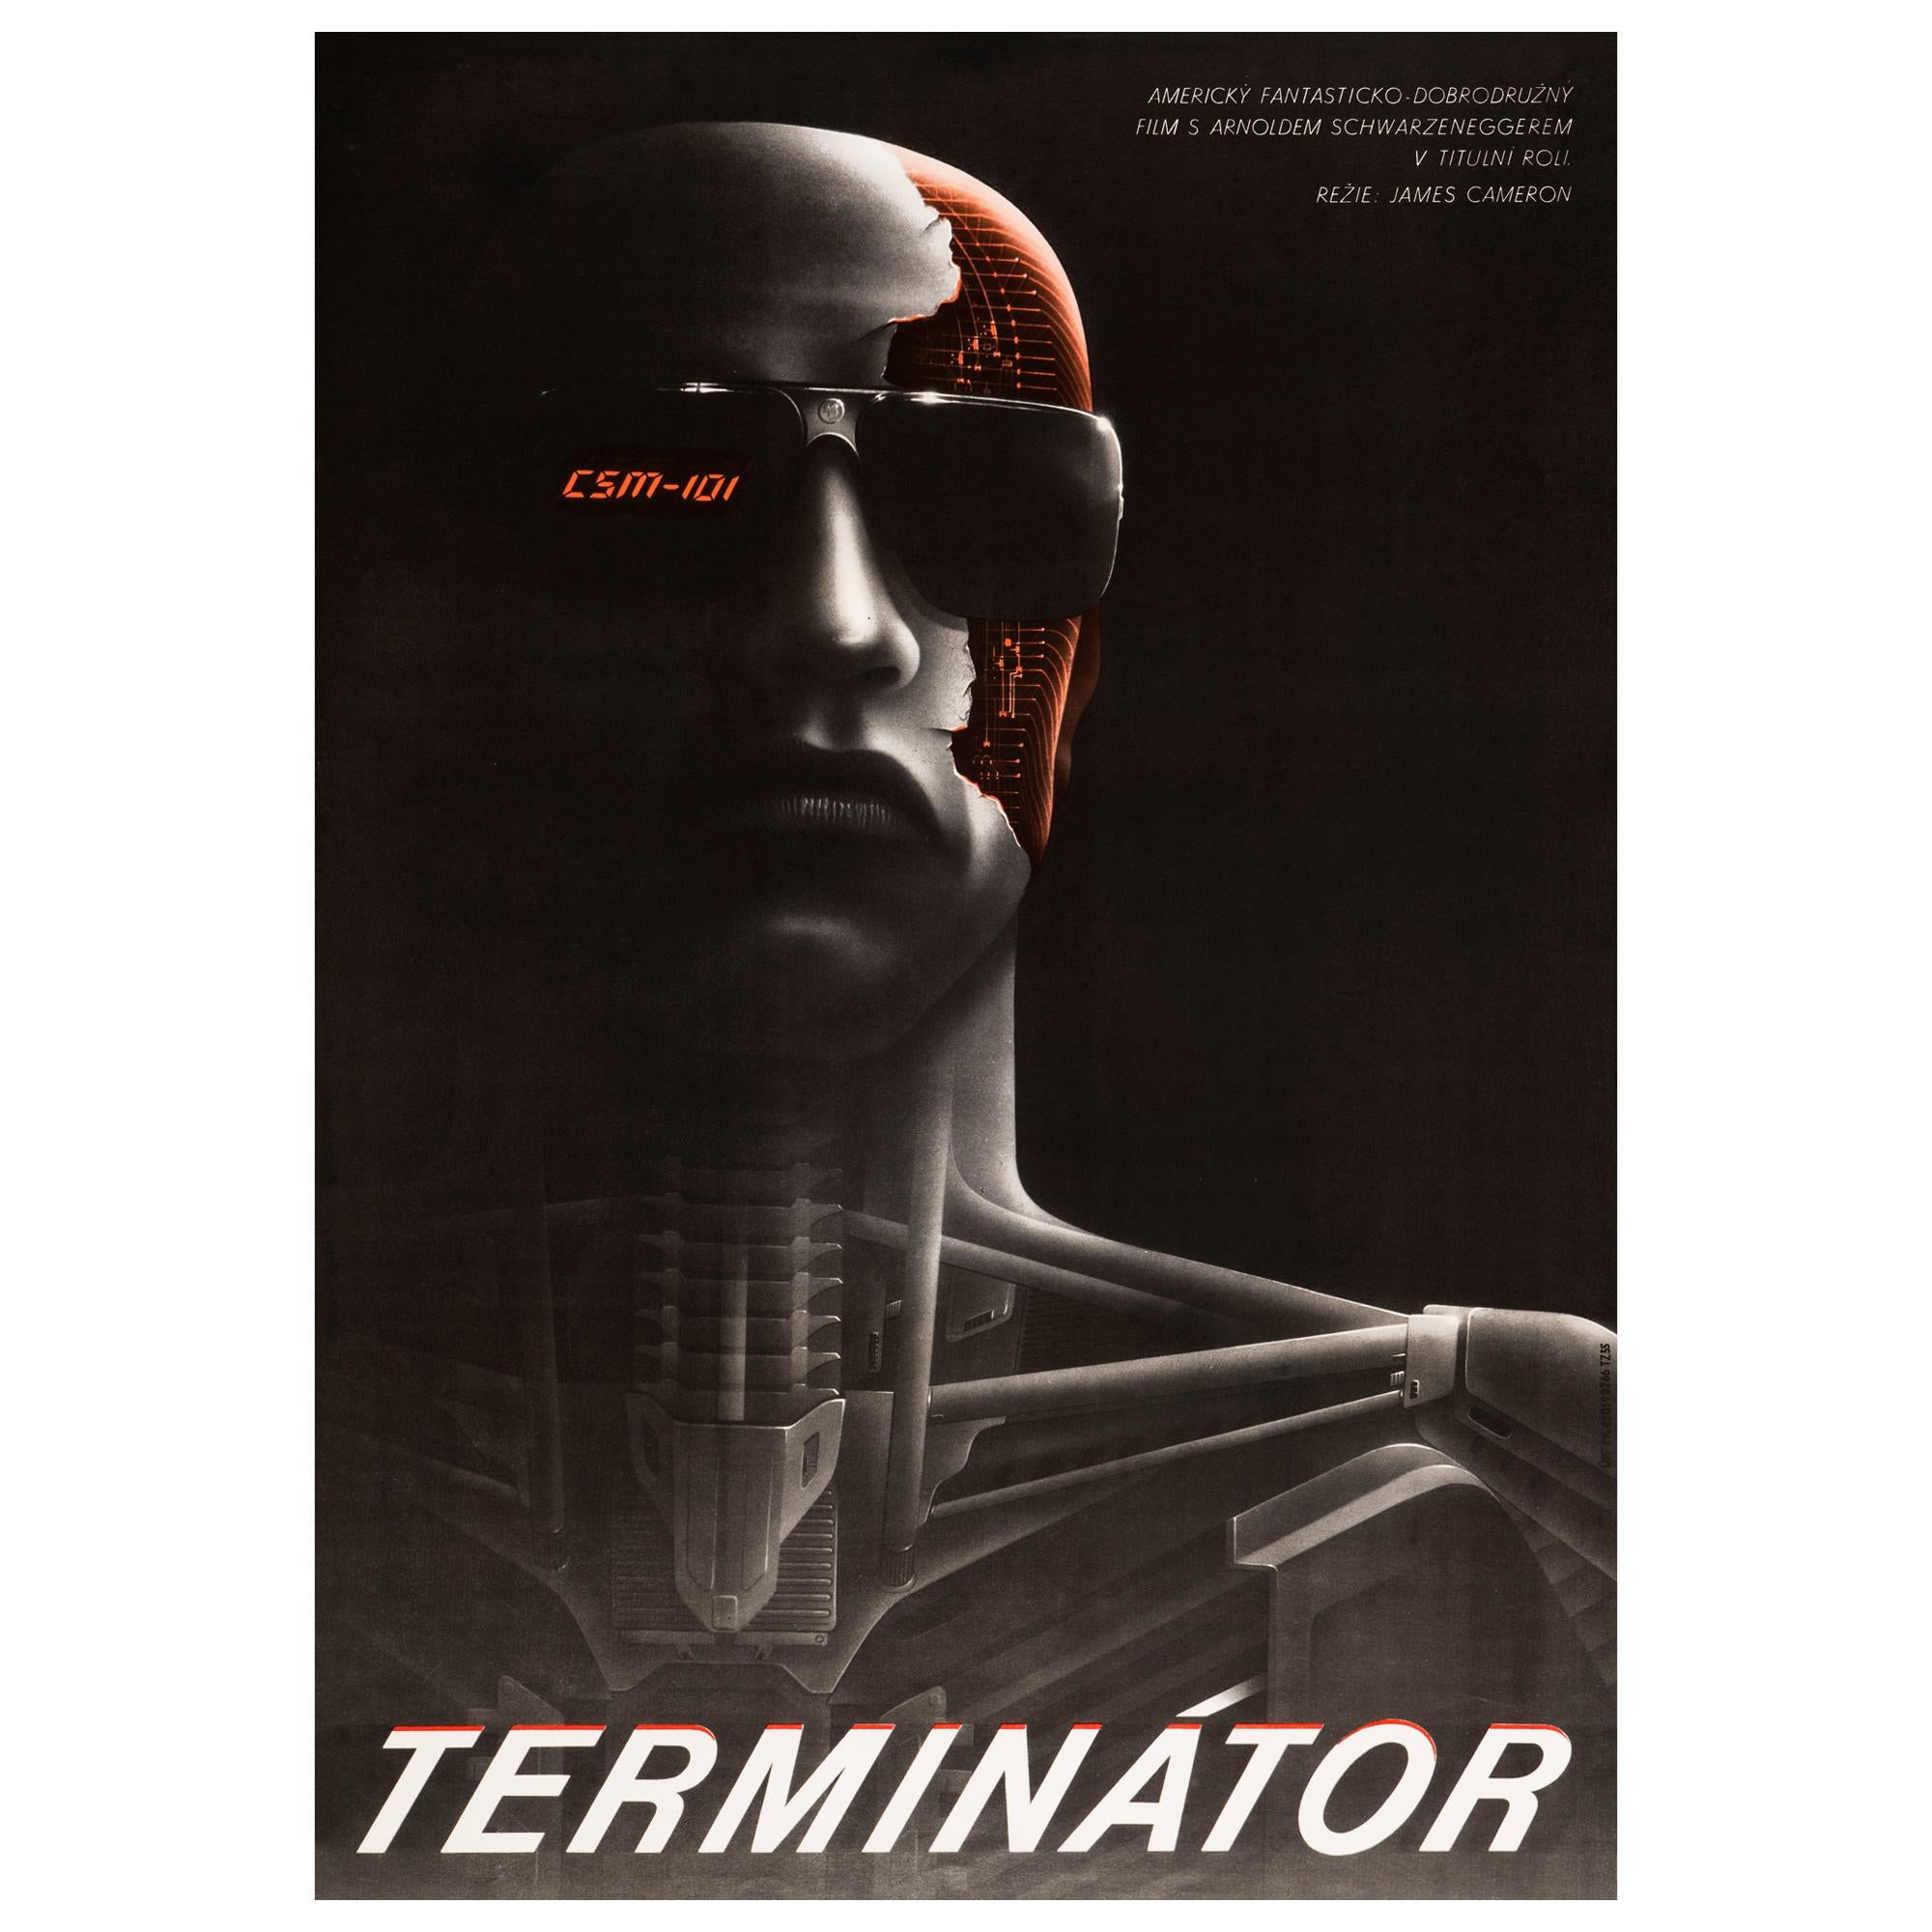 'The Terminator' Original Vintage Movie Poster by Milan Pecák, Czech, 1990